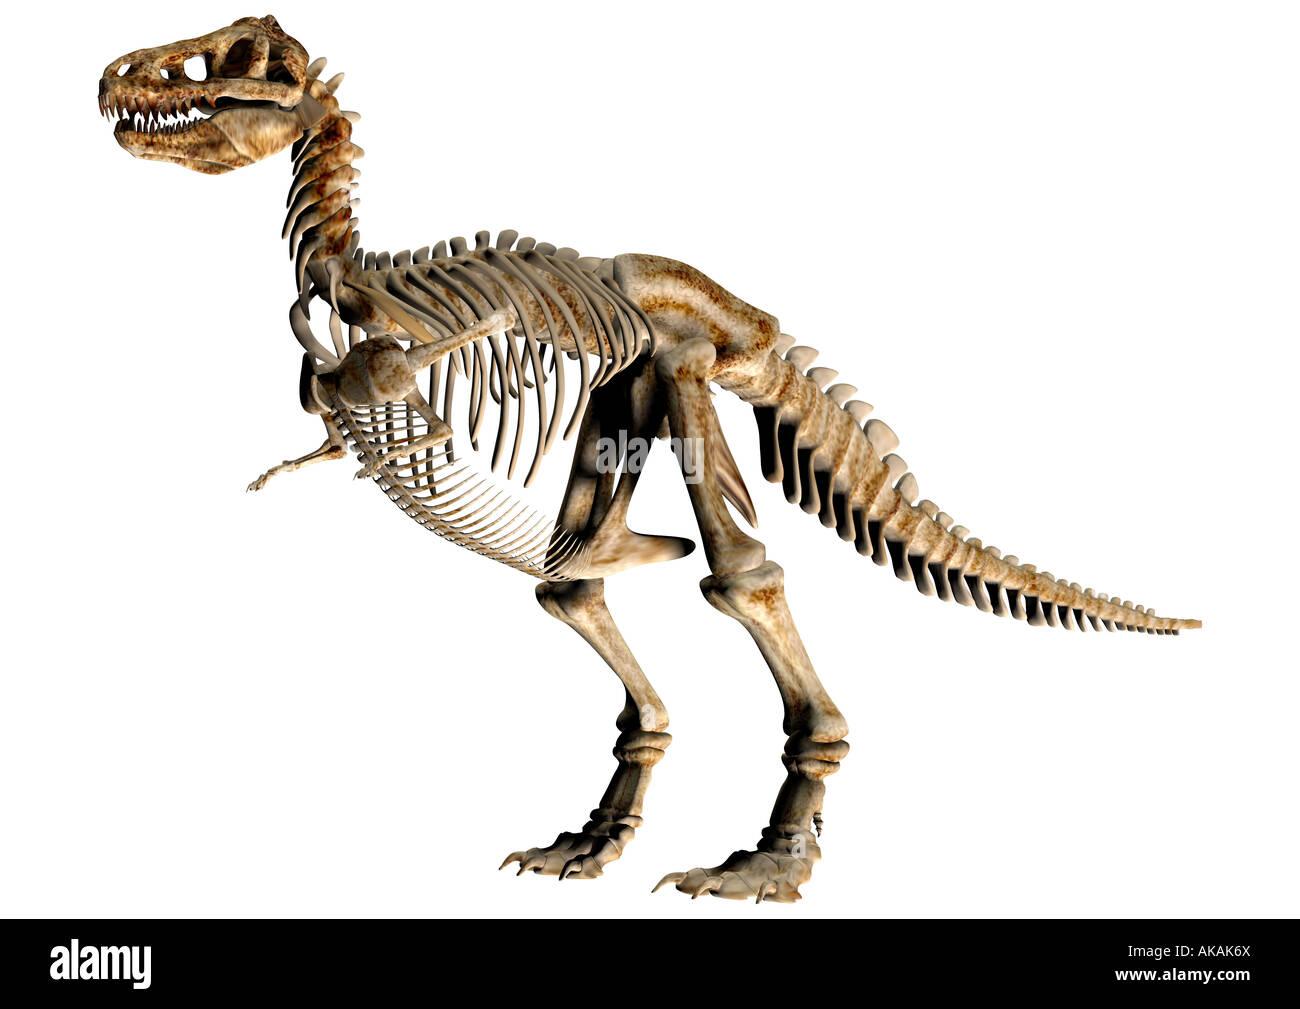 Esqueleto de dinosaurio Dinosaurier Skelett Imagen De Stock